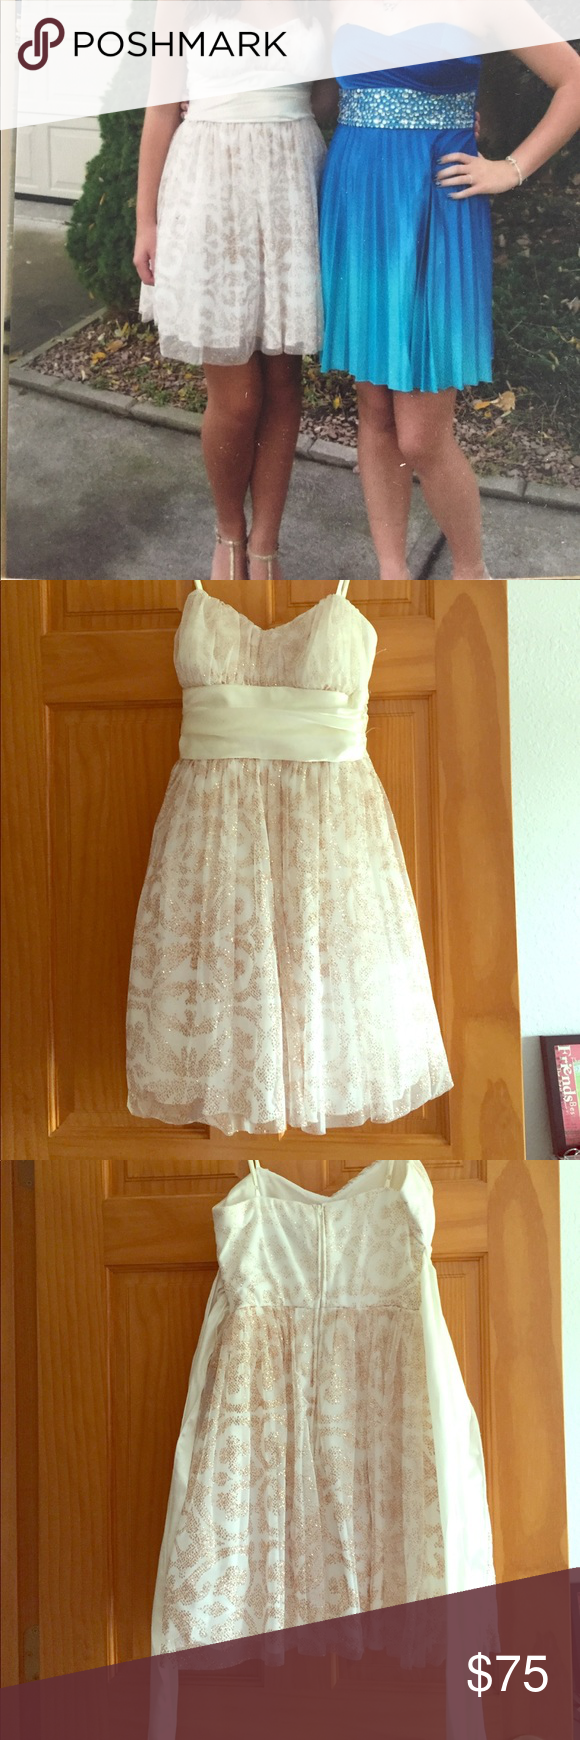 B darlin dress absolutely stunning b darlin dress worn once for